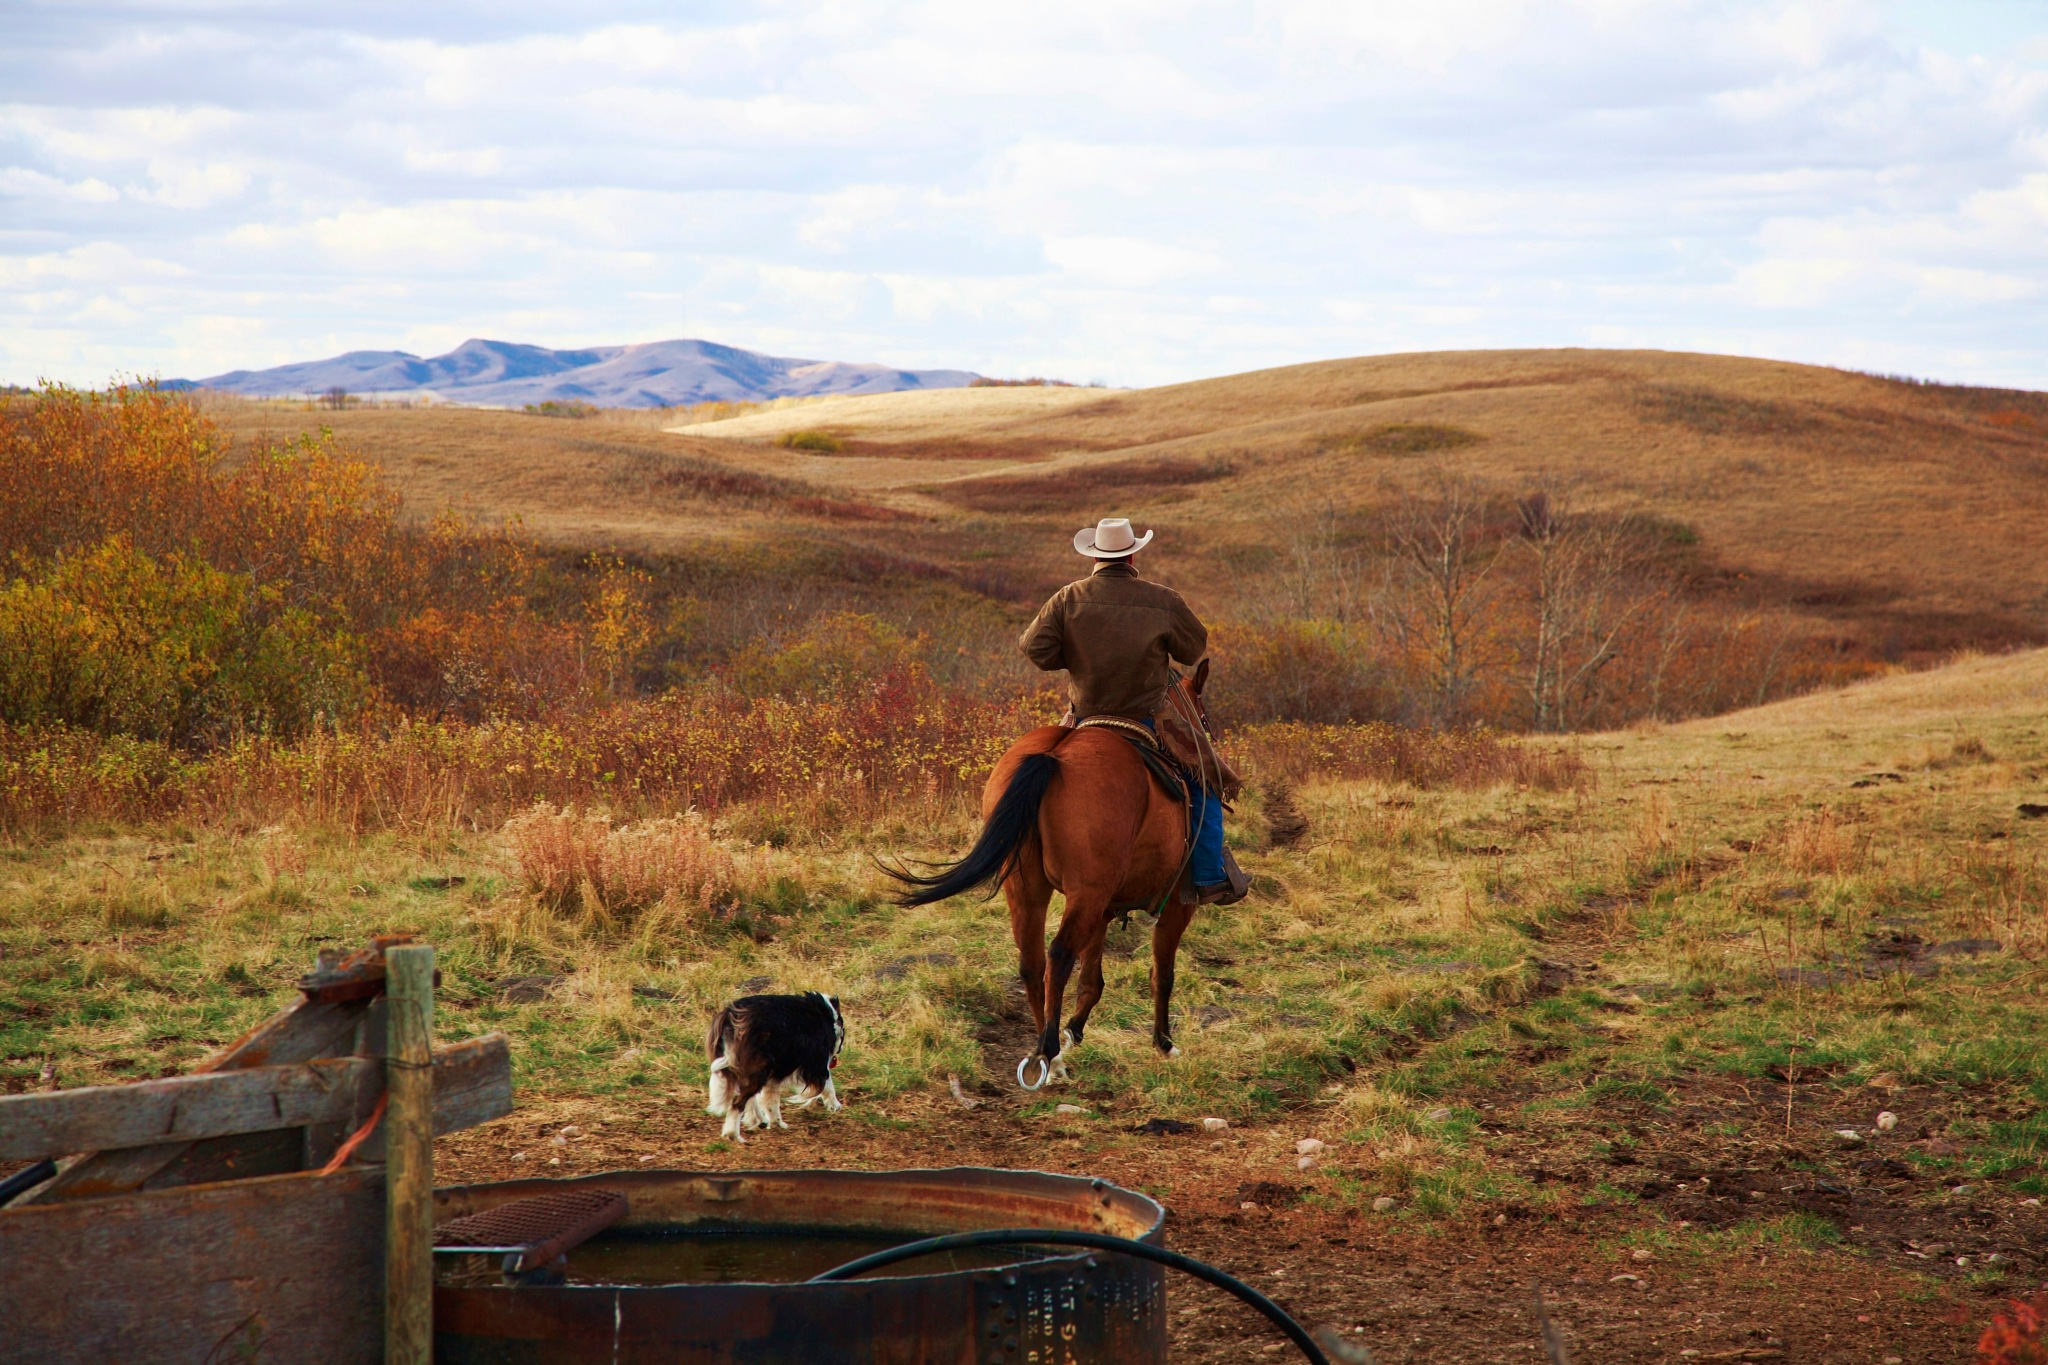 Cowboy take me away by Miloliidrifter